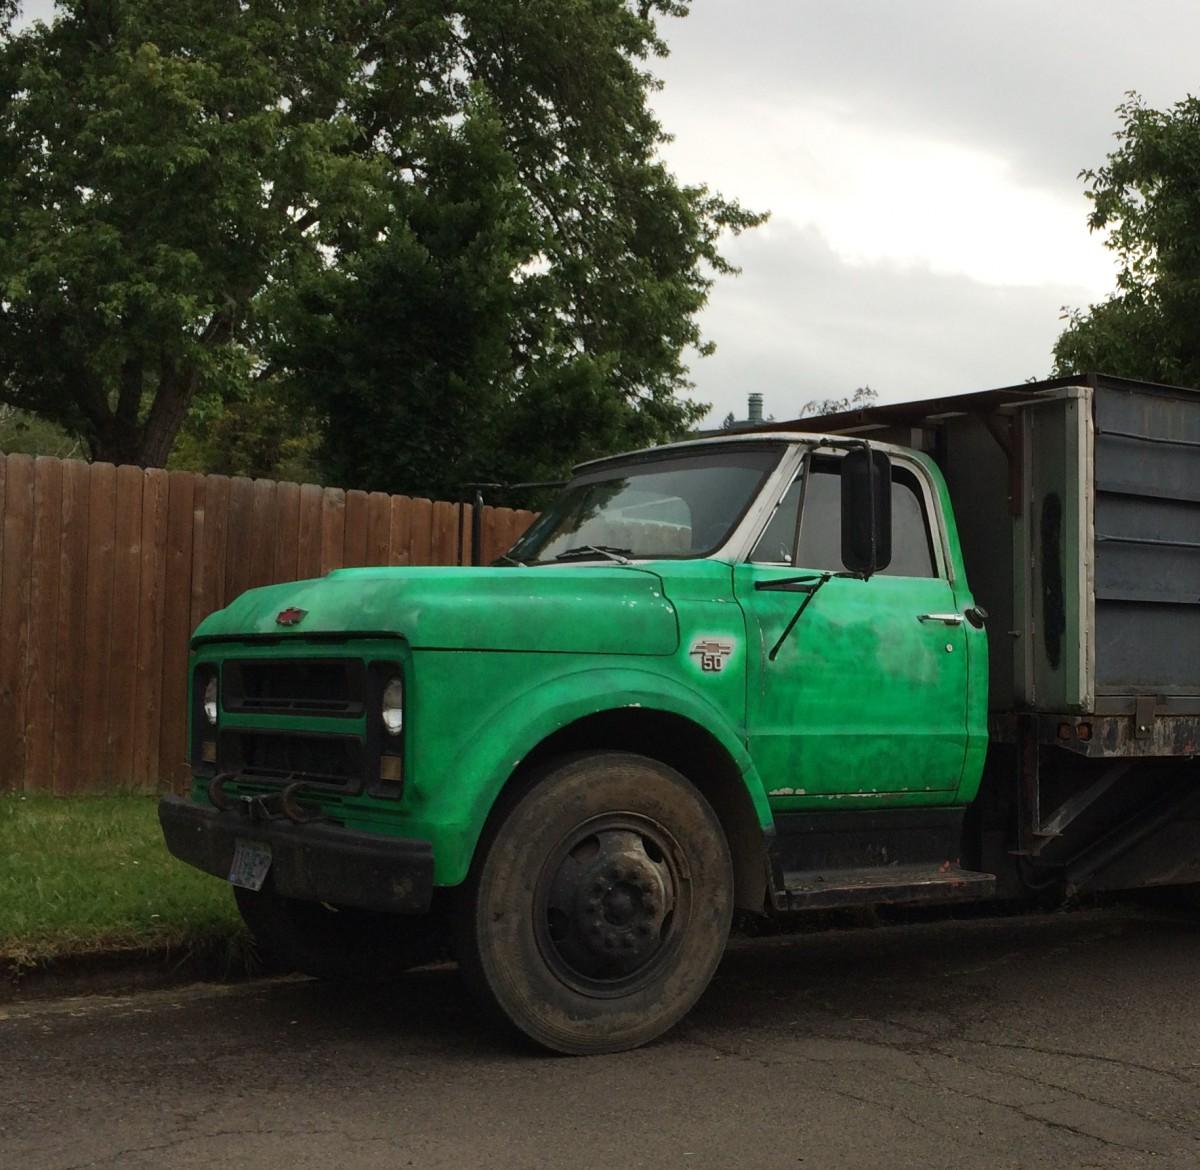 File:1971 Chevrolet C50 dump truck, Roxbury NY.jpg ...   C50 Truck